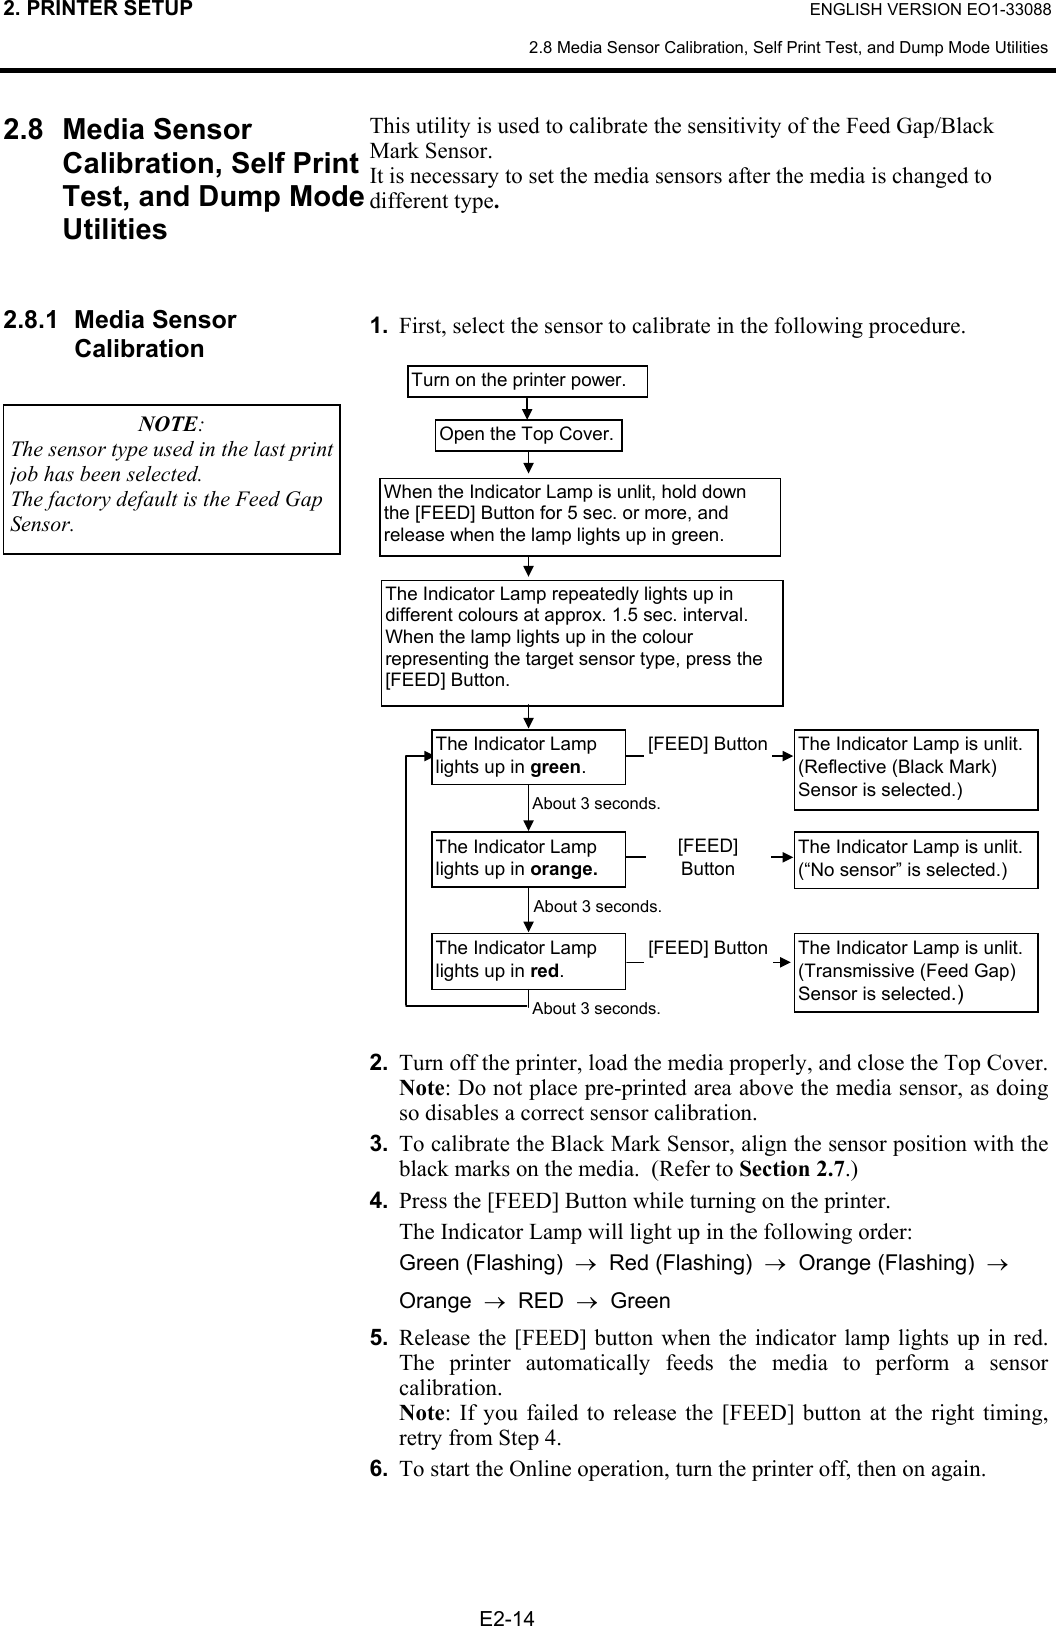 Toshiba B Ev4D Series Owners Manual Owner's EO1 33088 November, 2008